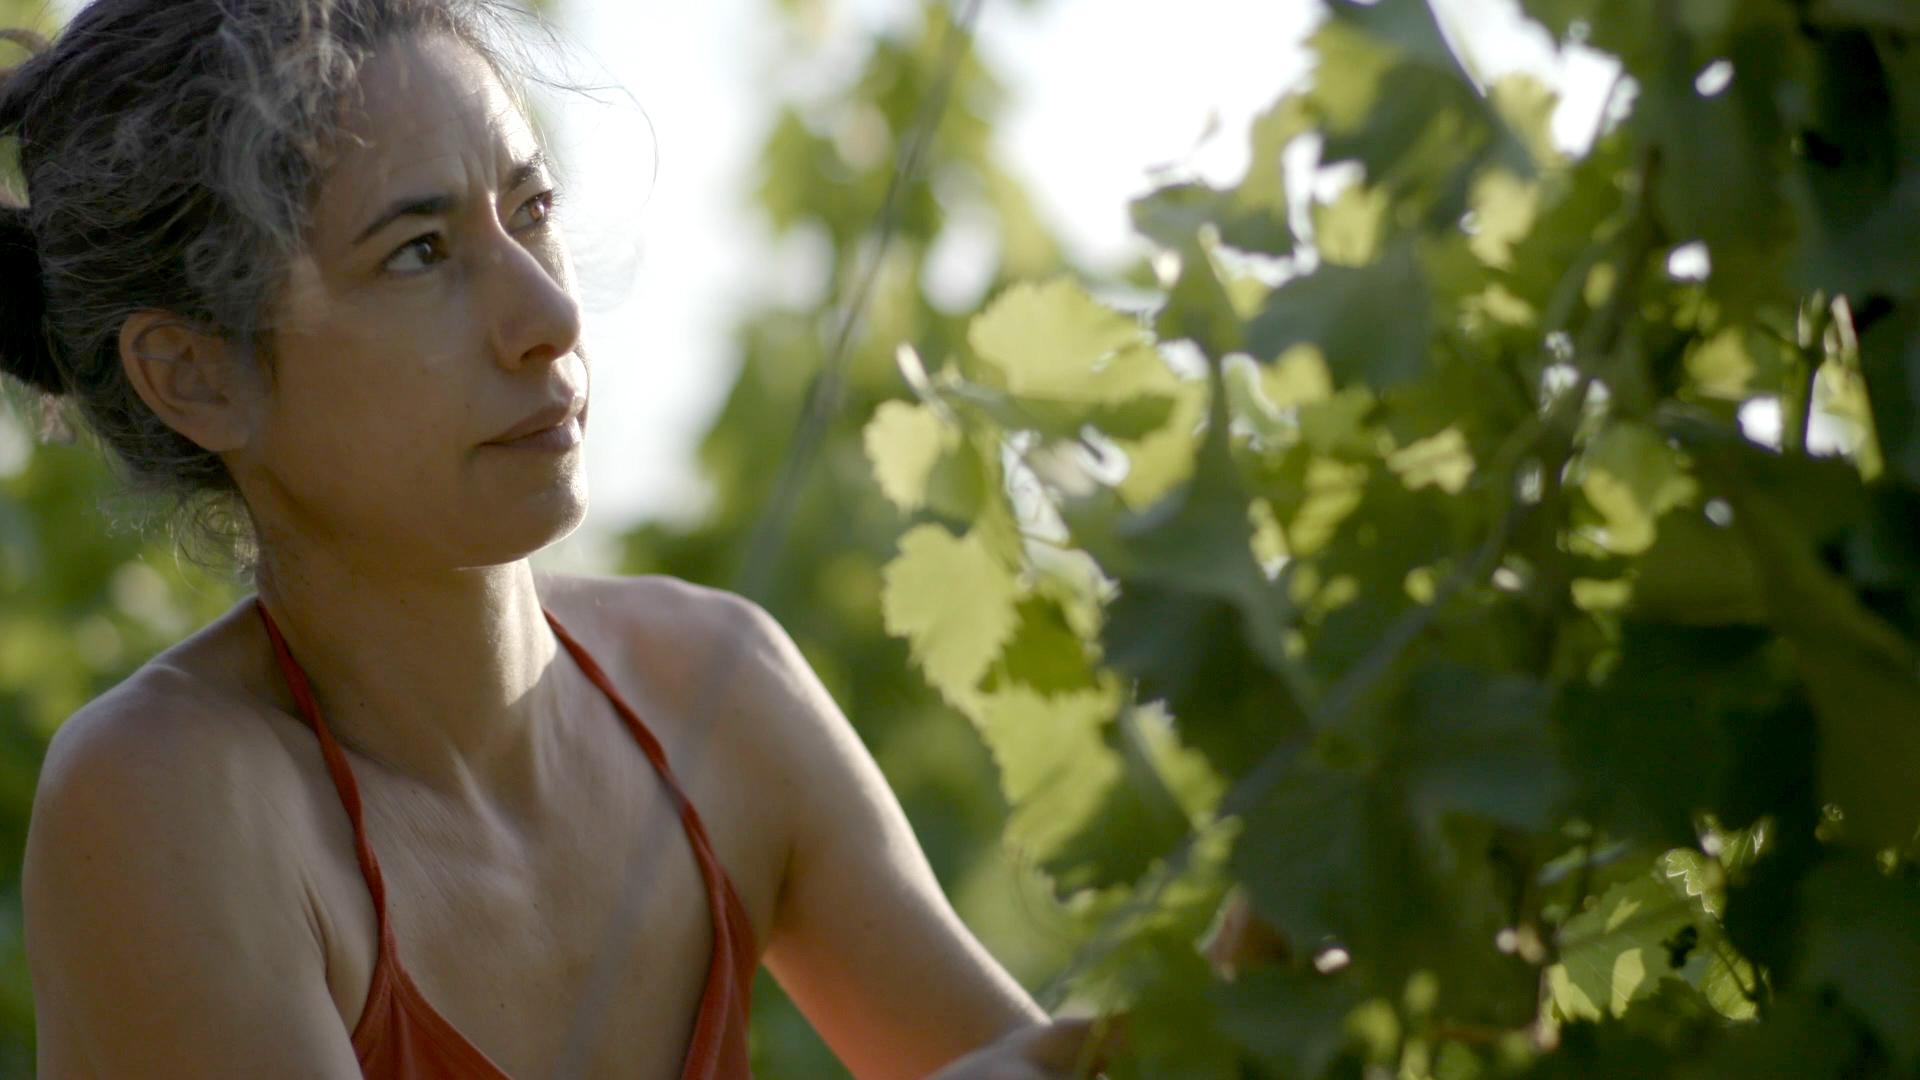 Film Still from Weed & Wine